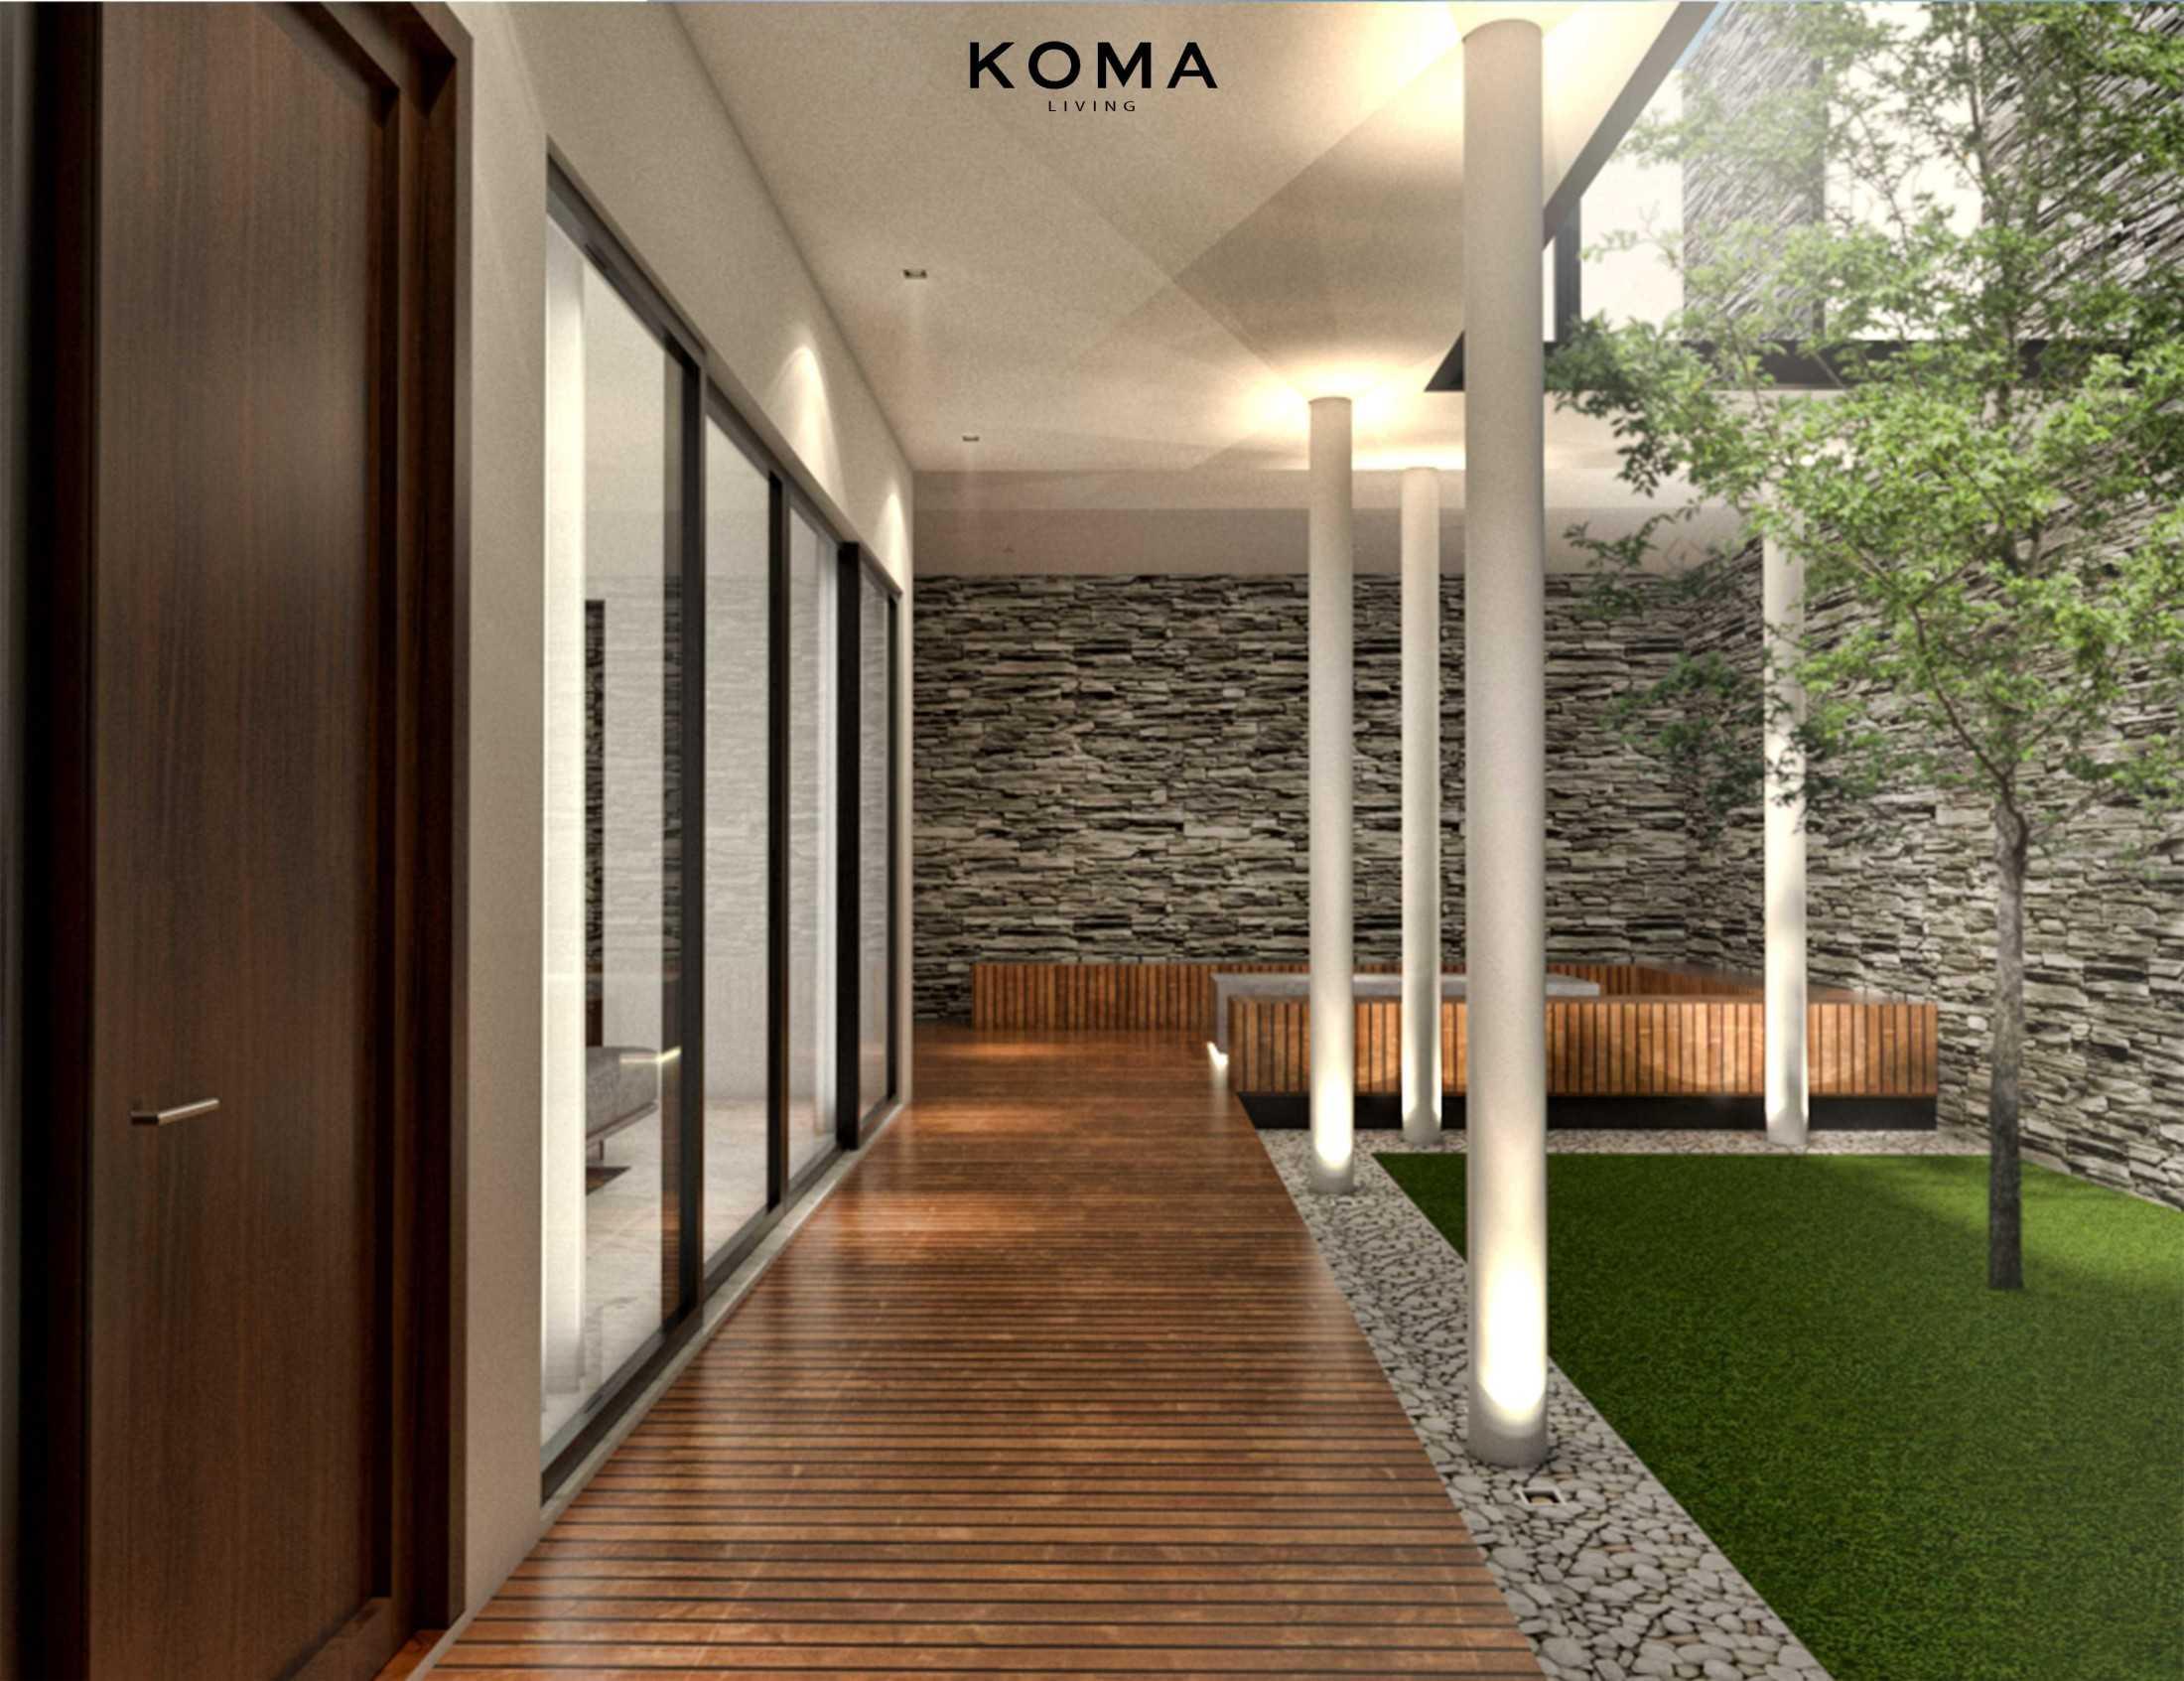 Koma Bs House Jl. Jalur Sutera No.17, Kunciran, Pinang, Kota Tangerang, Banten 15143, Indonesia Jl. Jalur Sutera No.17, Kunciran, Pinang, Kota Tangerang, Banten 15143, Indonesia Koma-Bs-House  70235